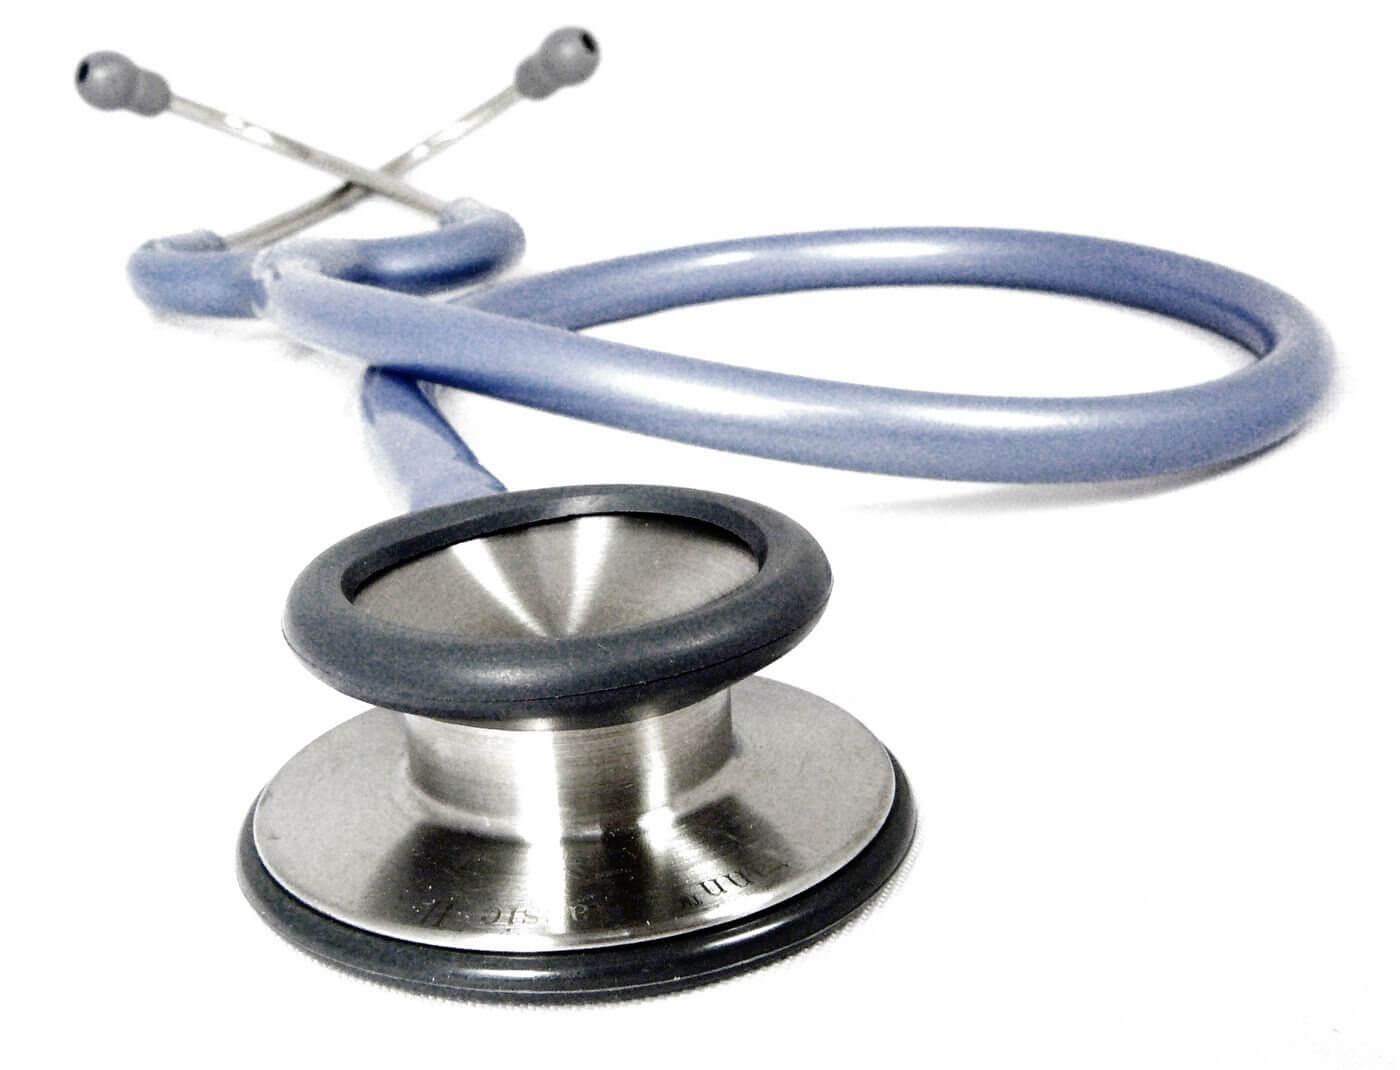 Doctors_stethoscope_1.jpg